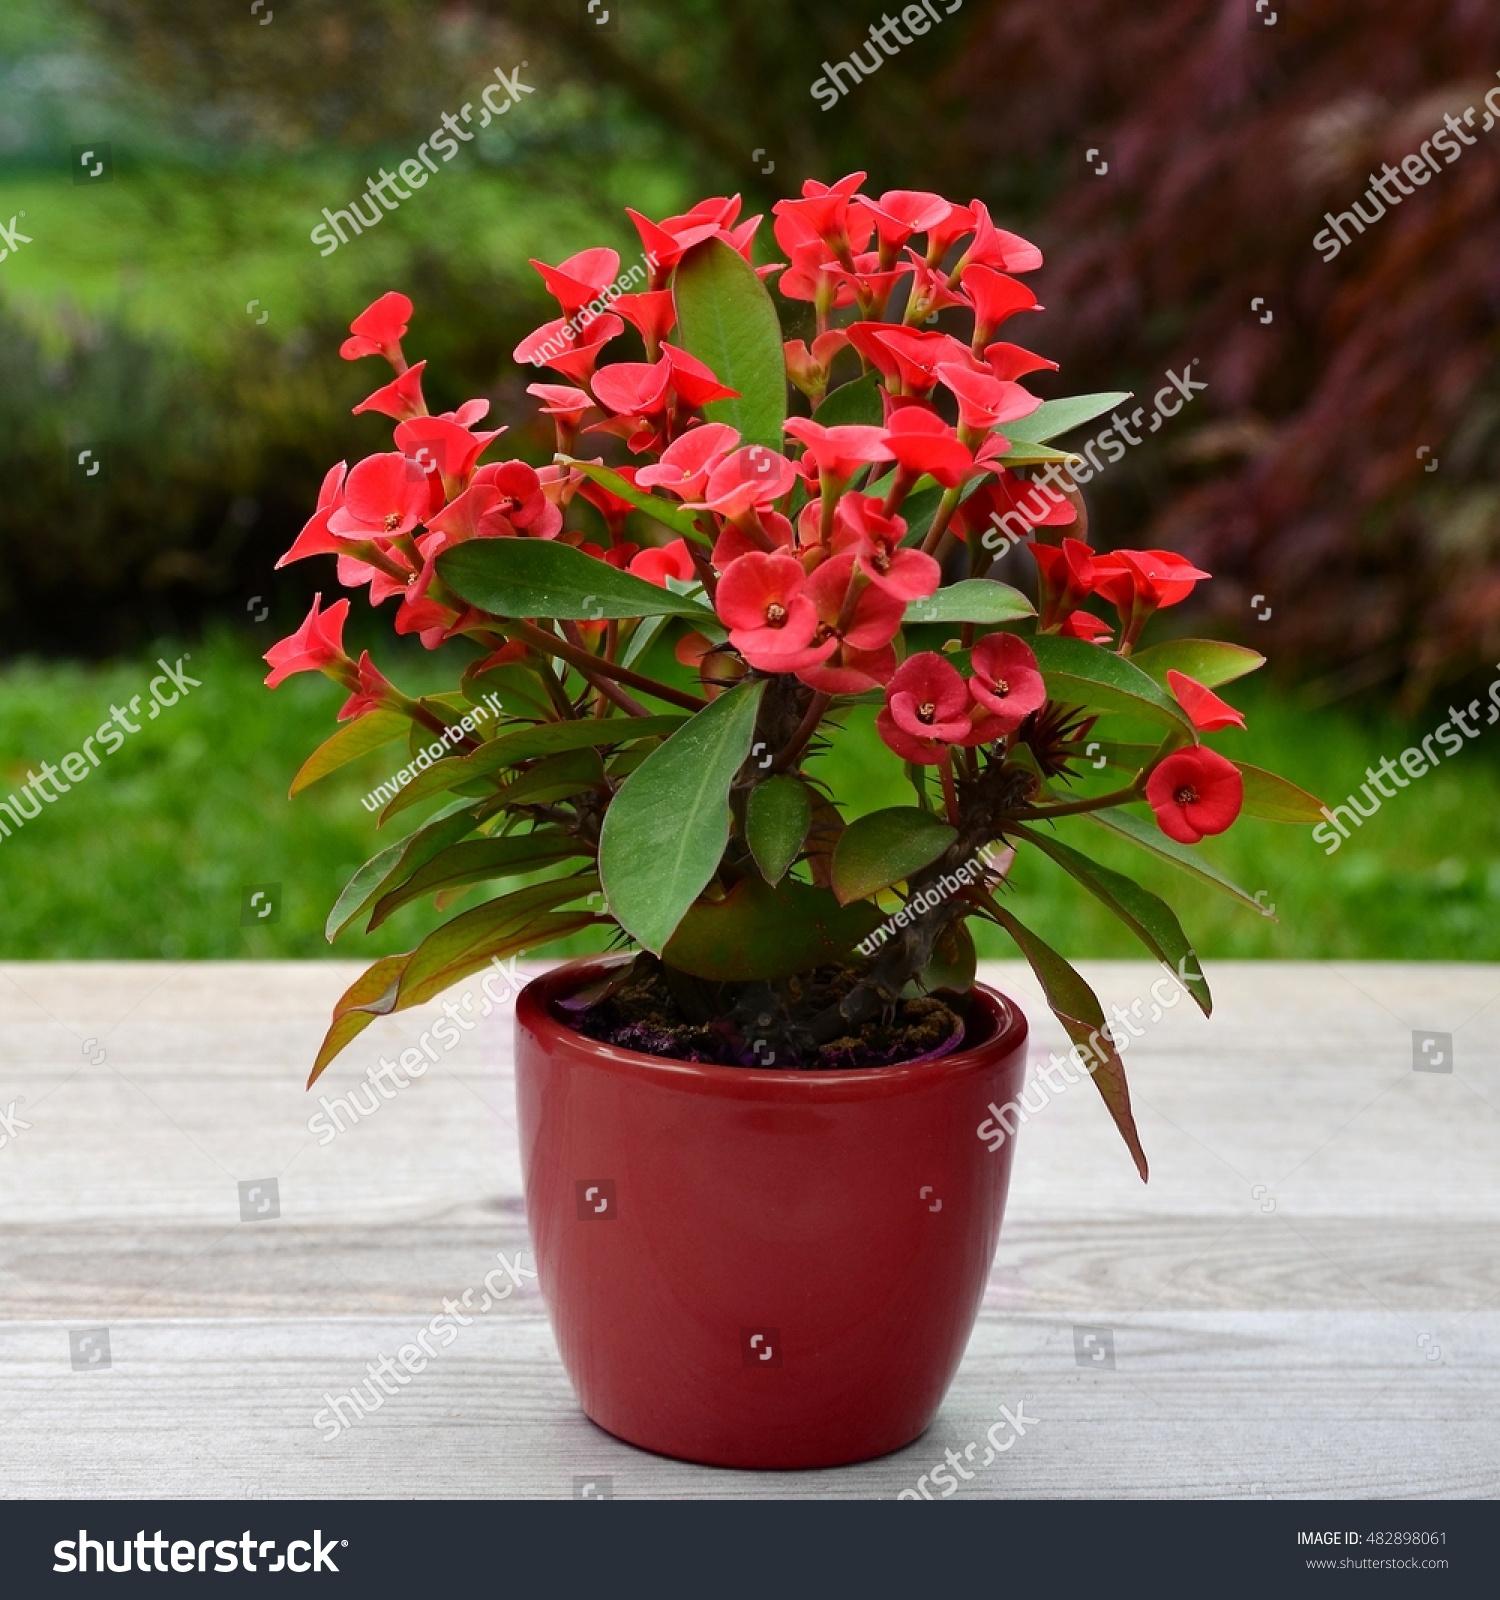 Euphorbia milii crown thorns christmas flower stock photo edit now euphorbia milii crown of thorns is christmas flower plant on old wood izmirmasajfo